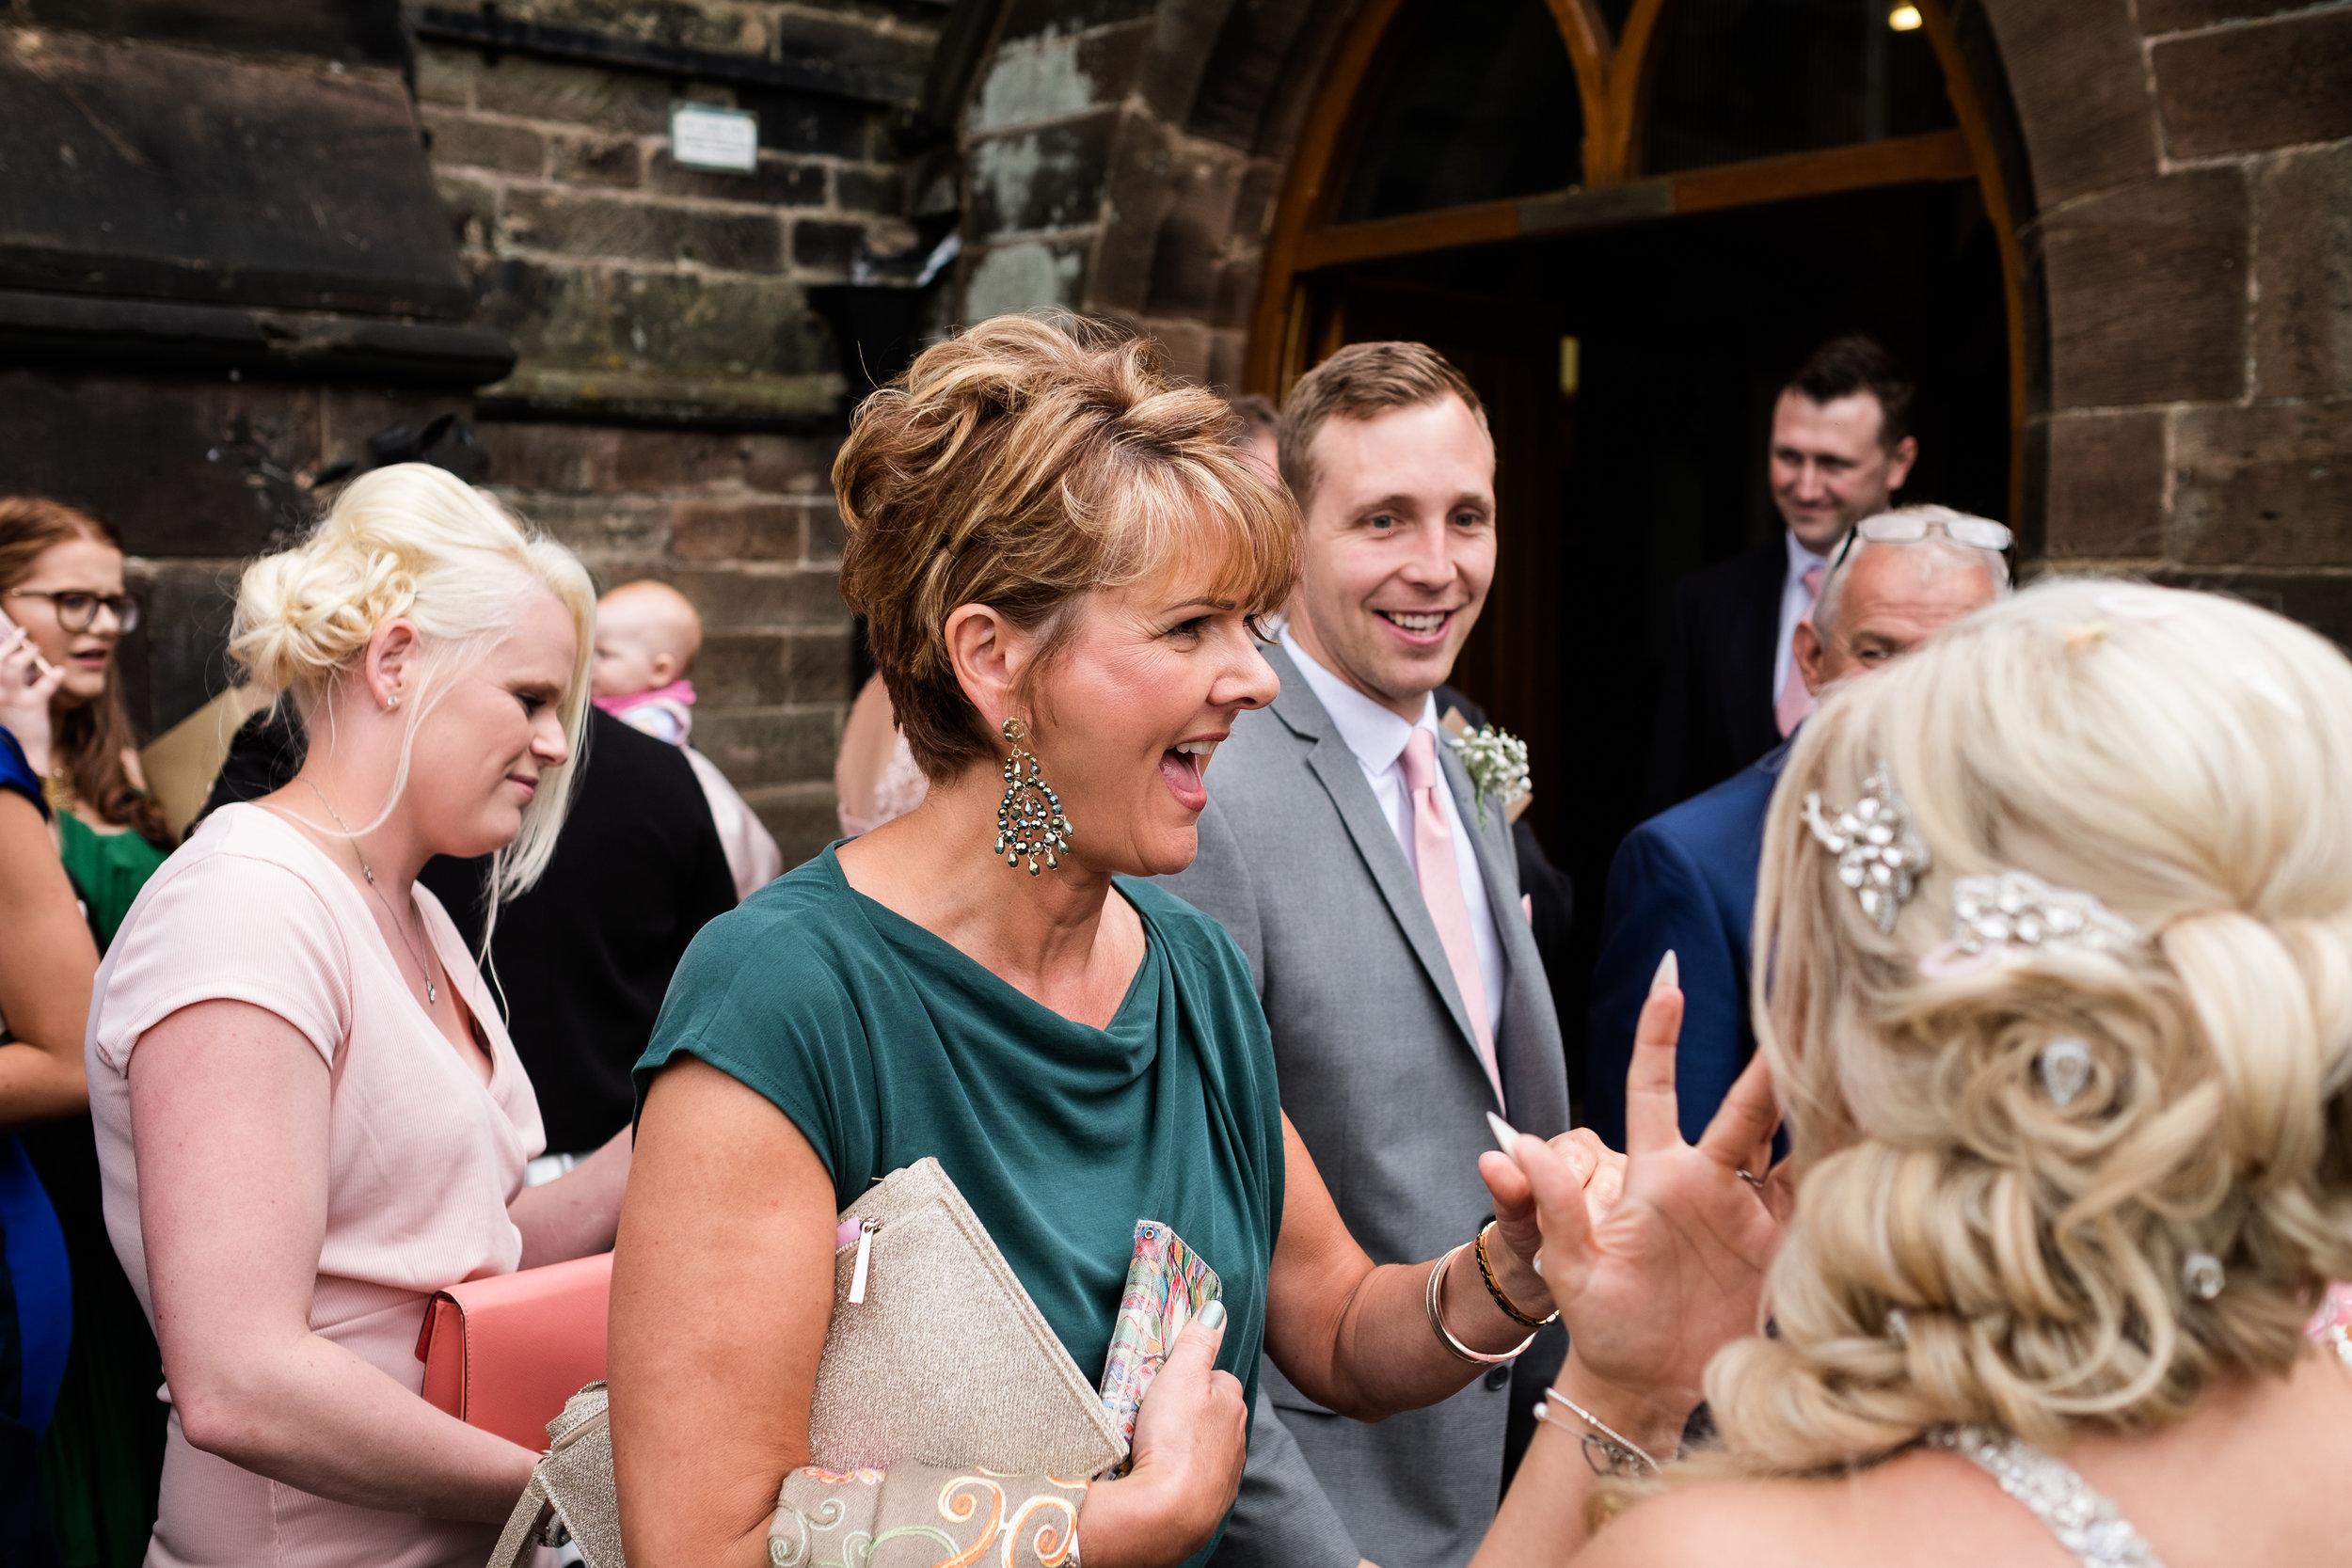 Summer Documentary Wedding Photography Floral Hall, Stoke-on-Trent, Staffordshire - Jenny Harper-31.jpg